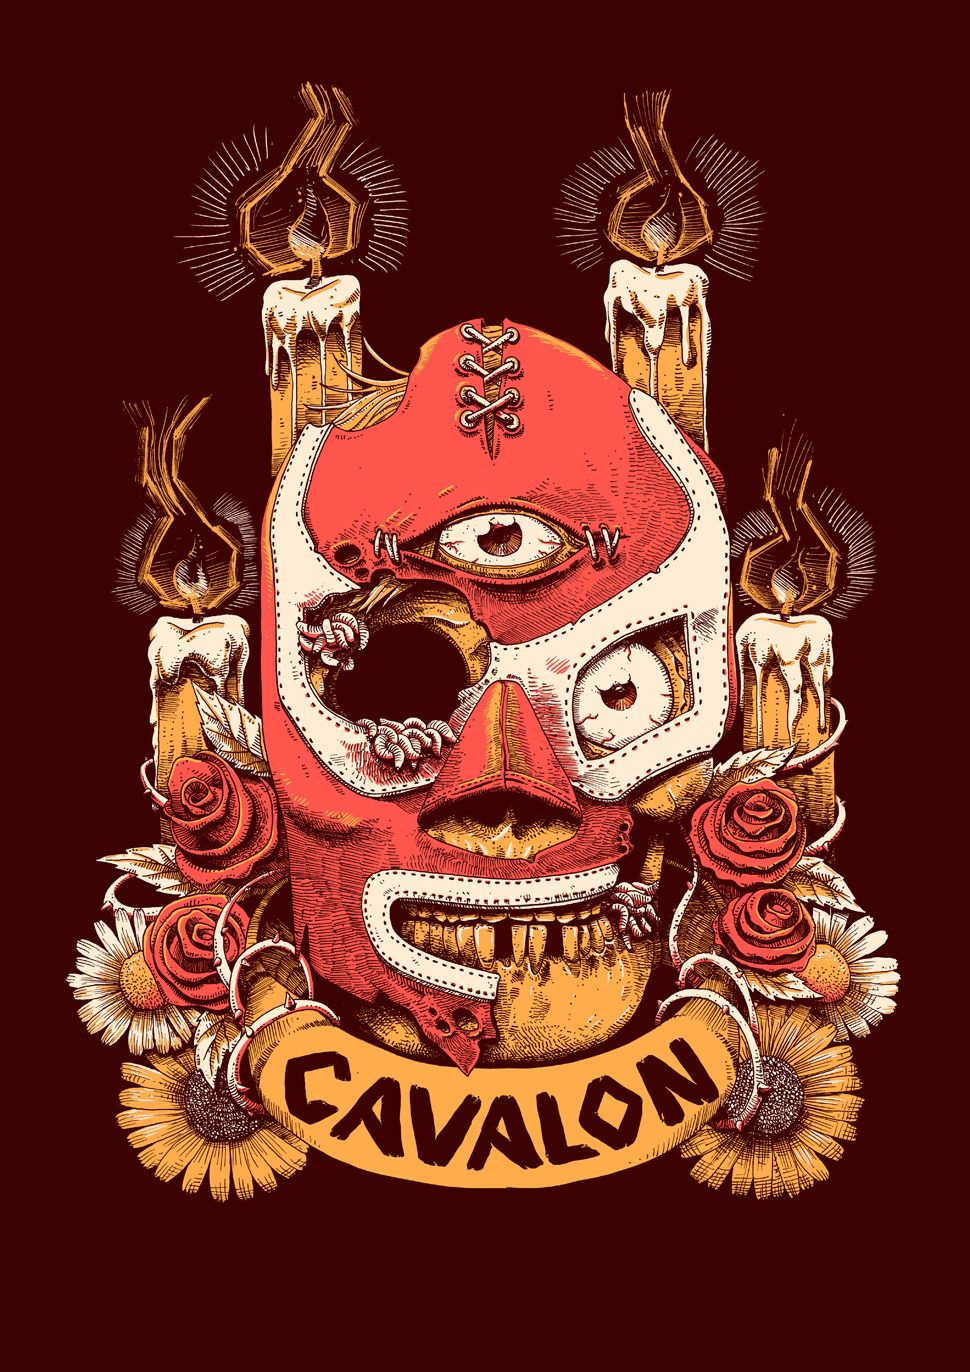 Cavalon on Behance